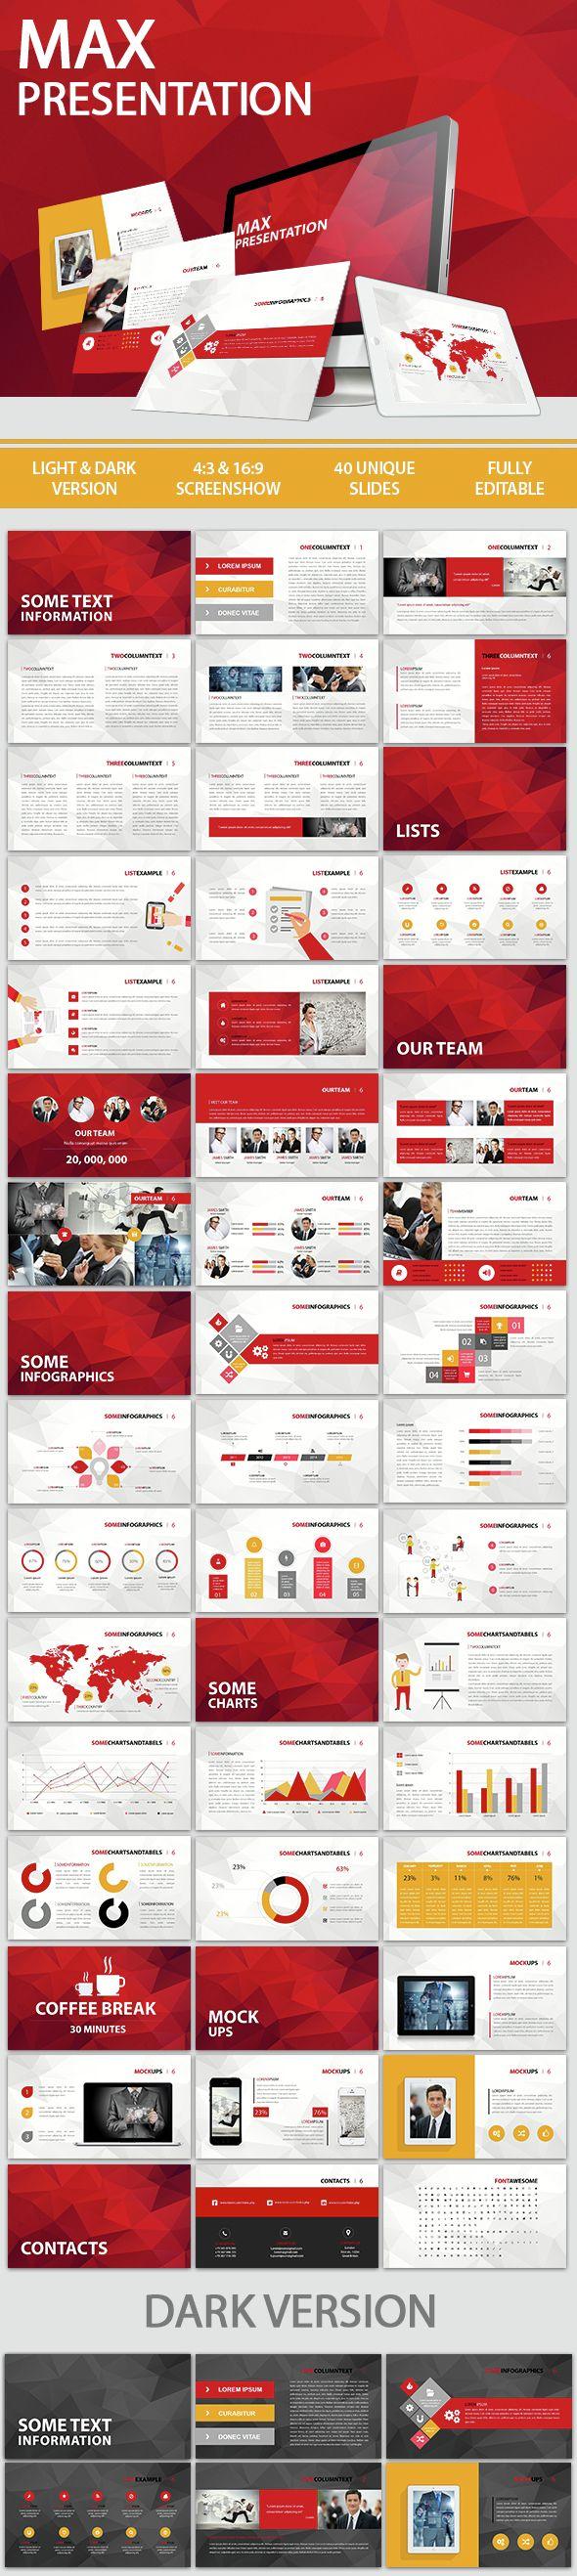 Max Presentation - Keynote Templates Presentation Templates